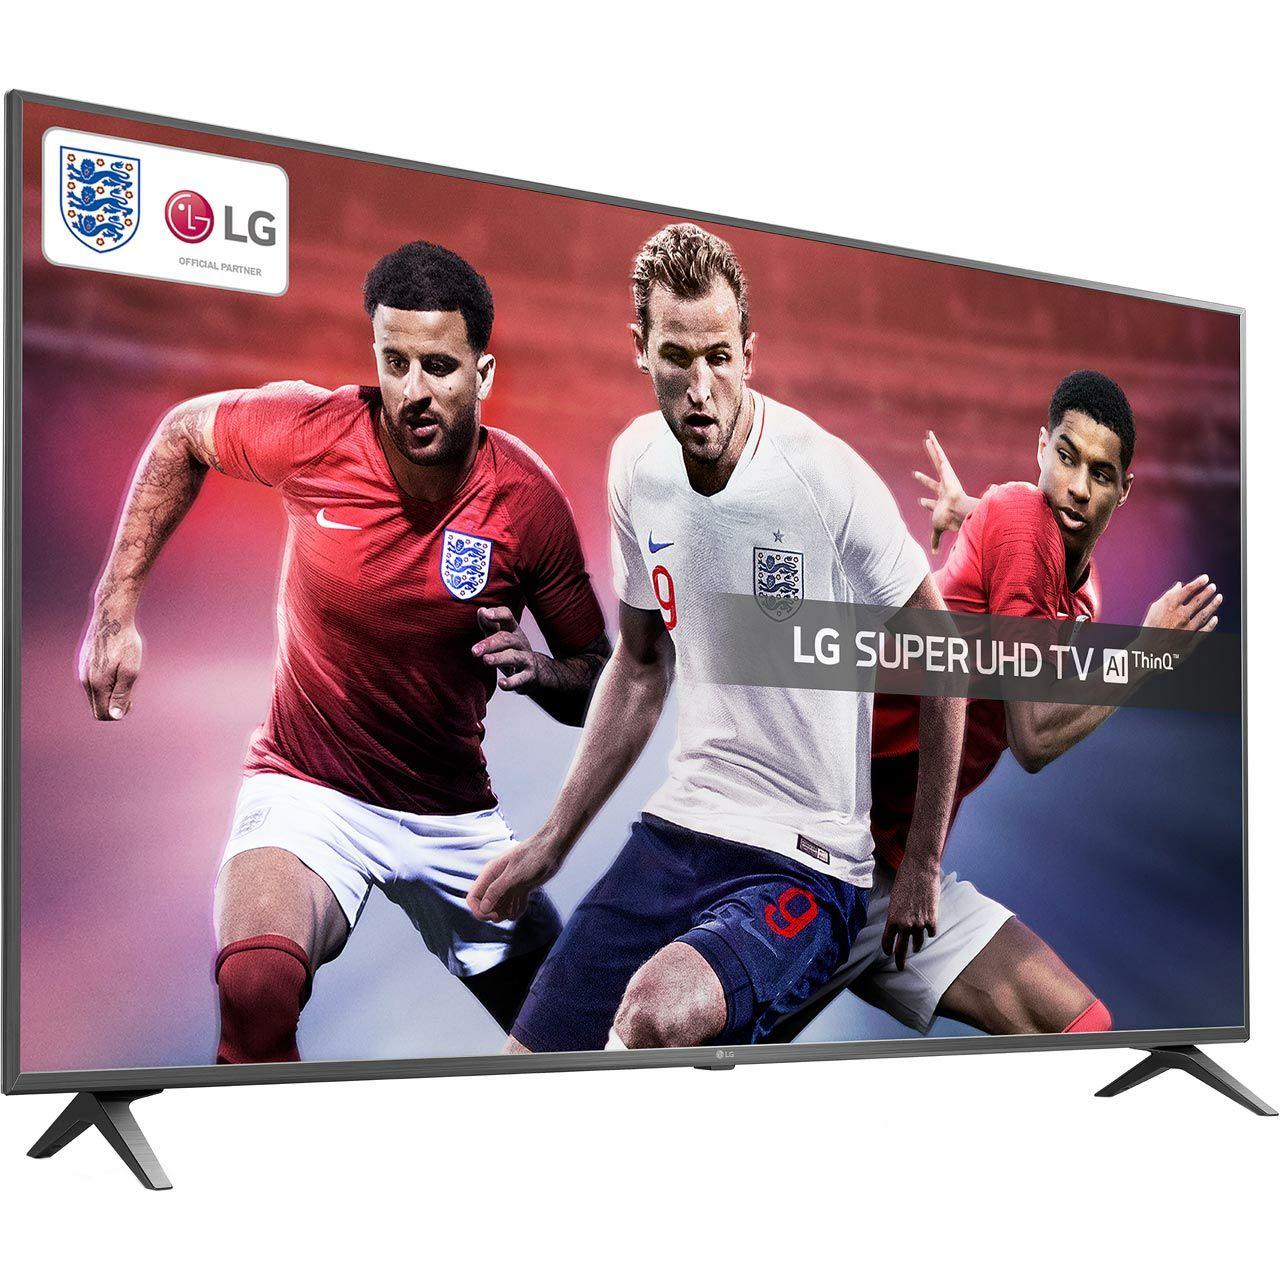 "LG 55SK8000PLB 55"" Smart 4K Ultra HD TV with free LG SK1 Bluetooth soundbar  £799 @ AO"